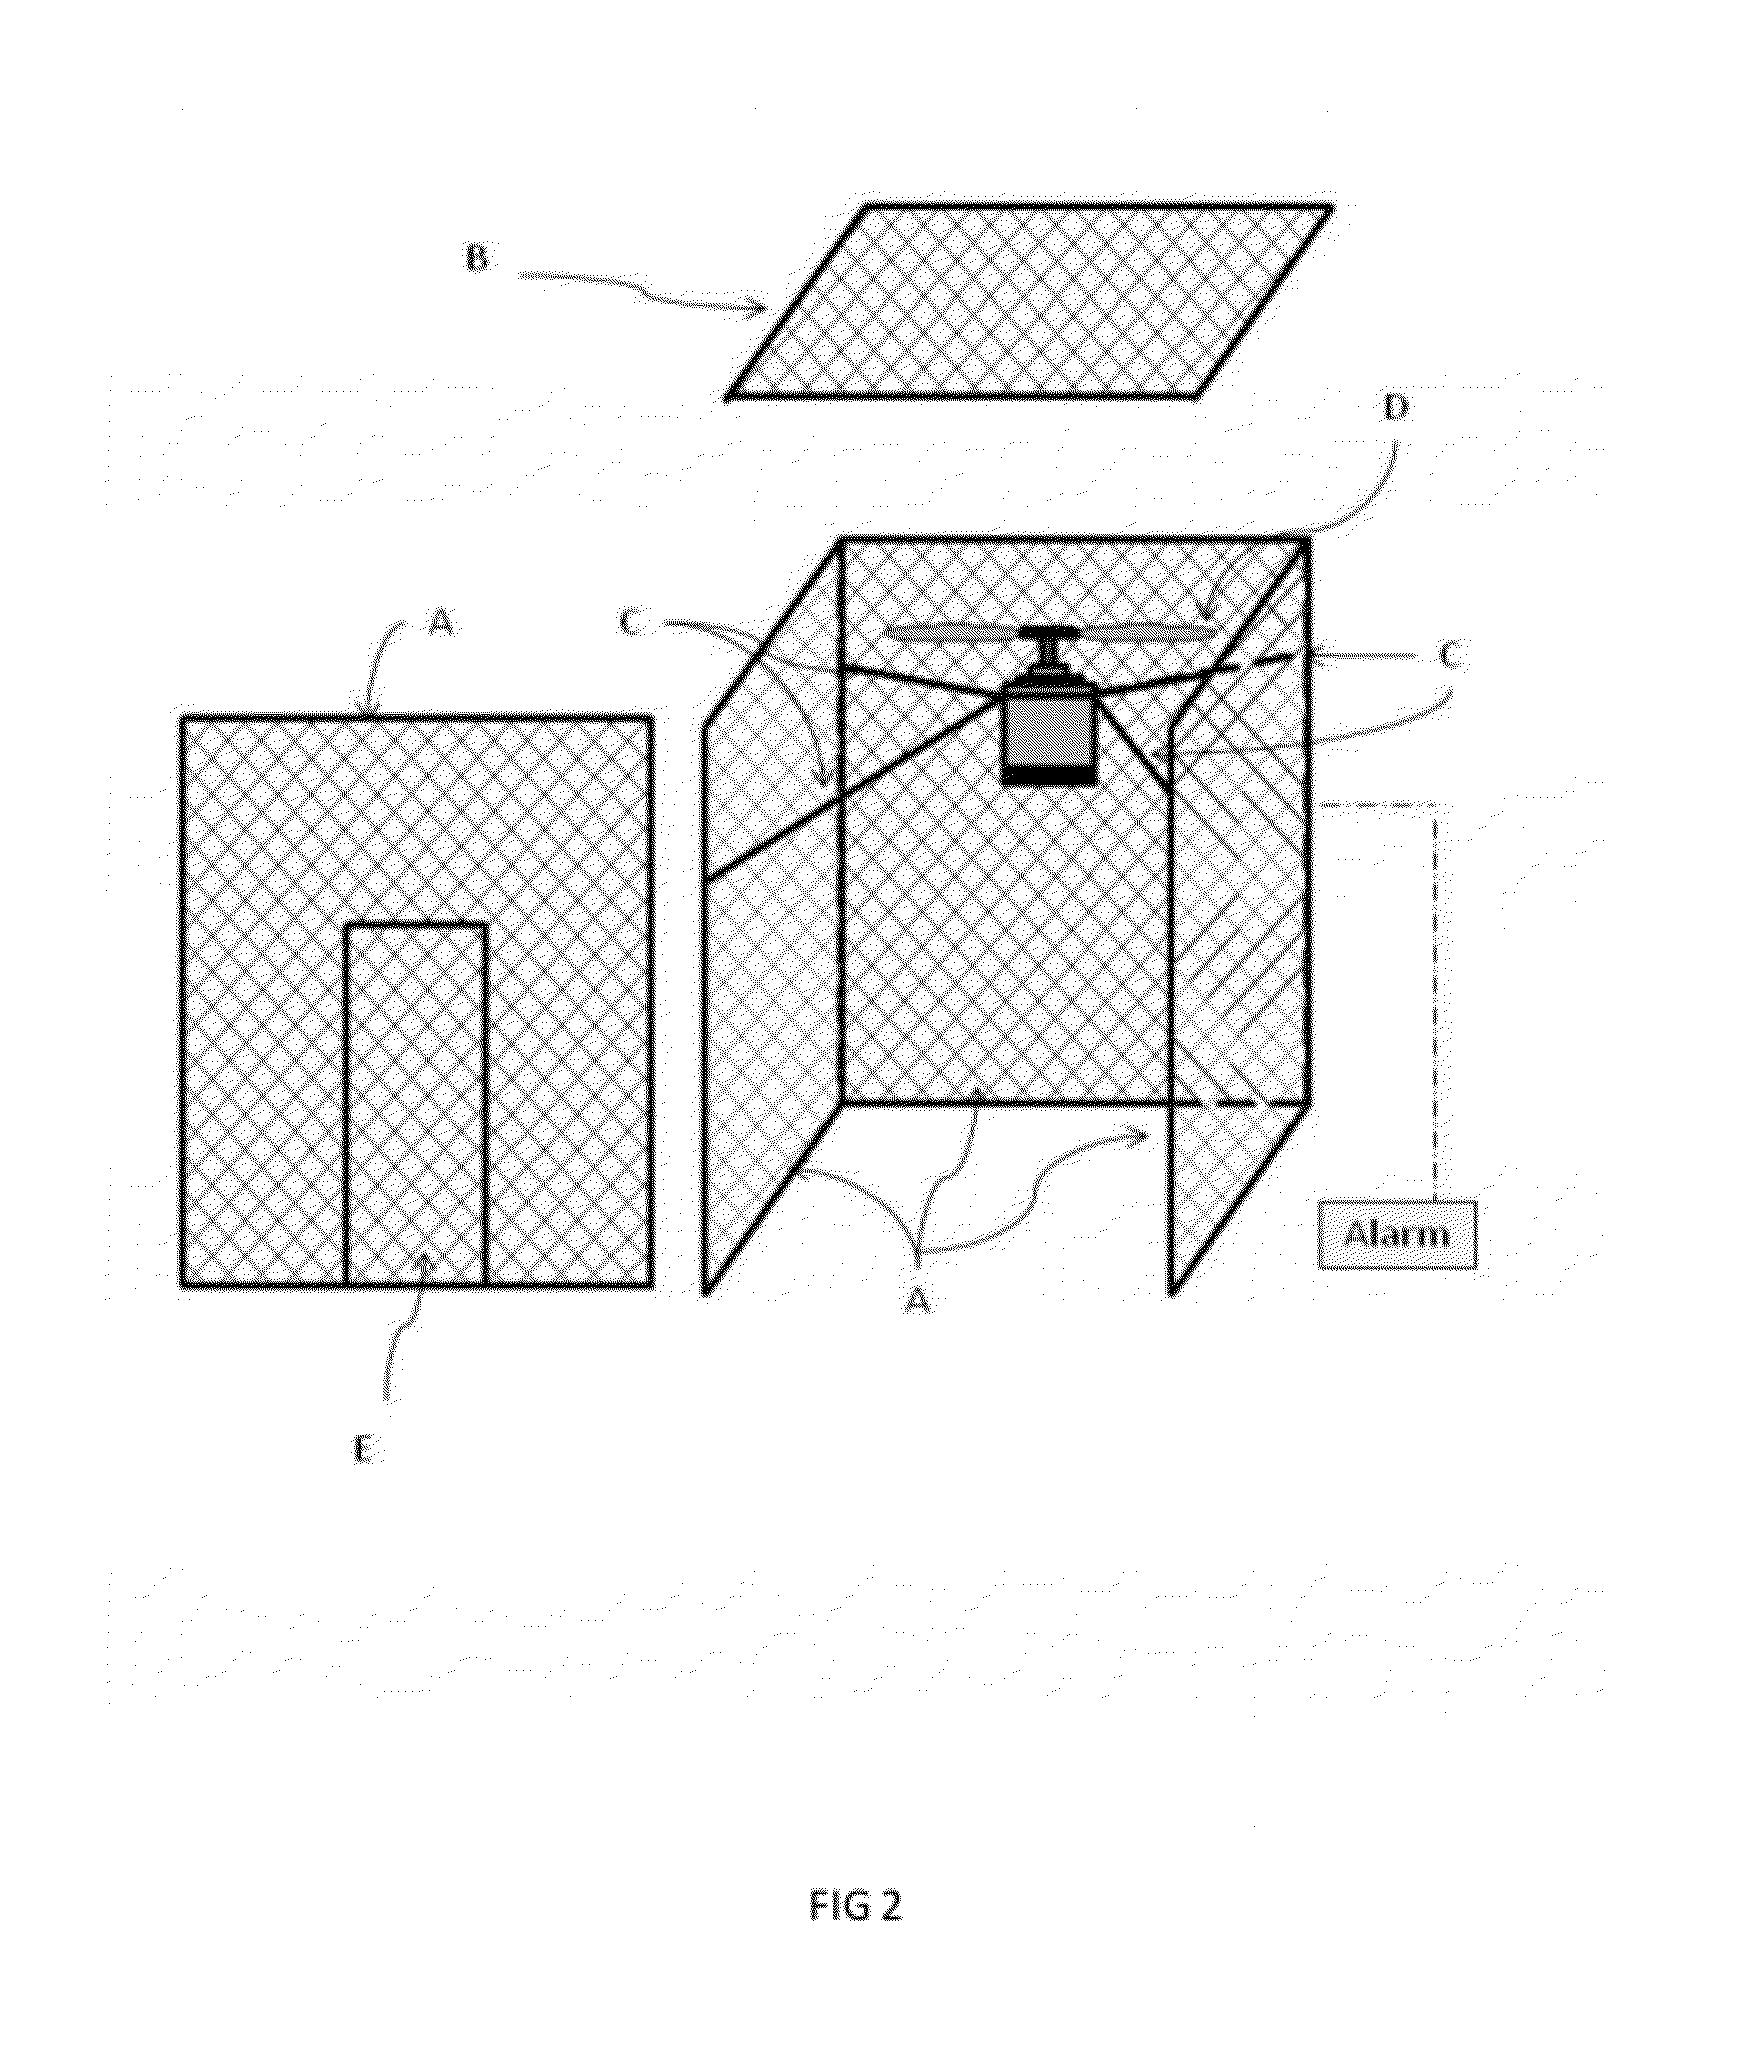 patent us20120126971  heat pump